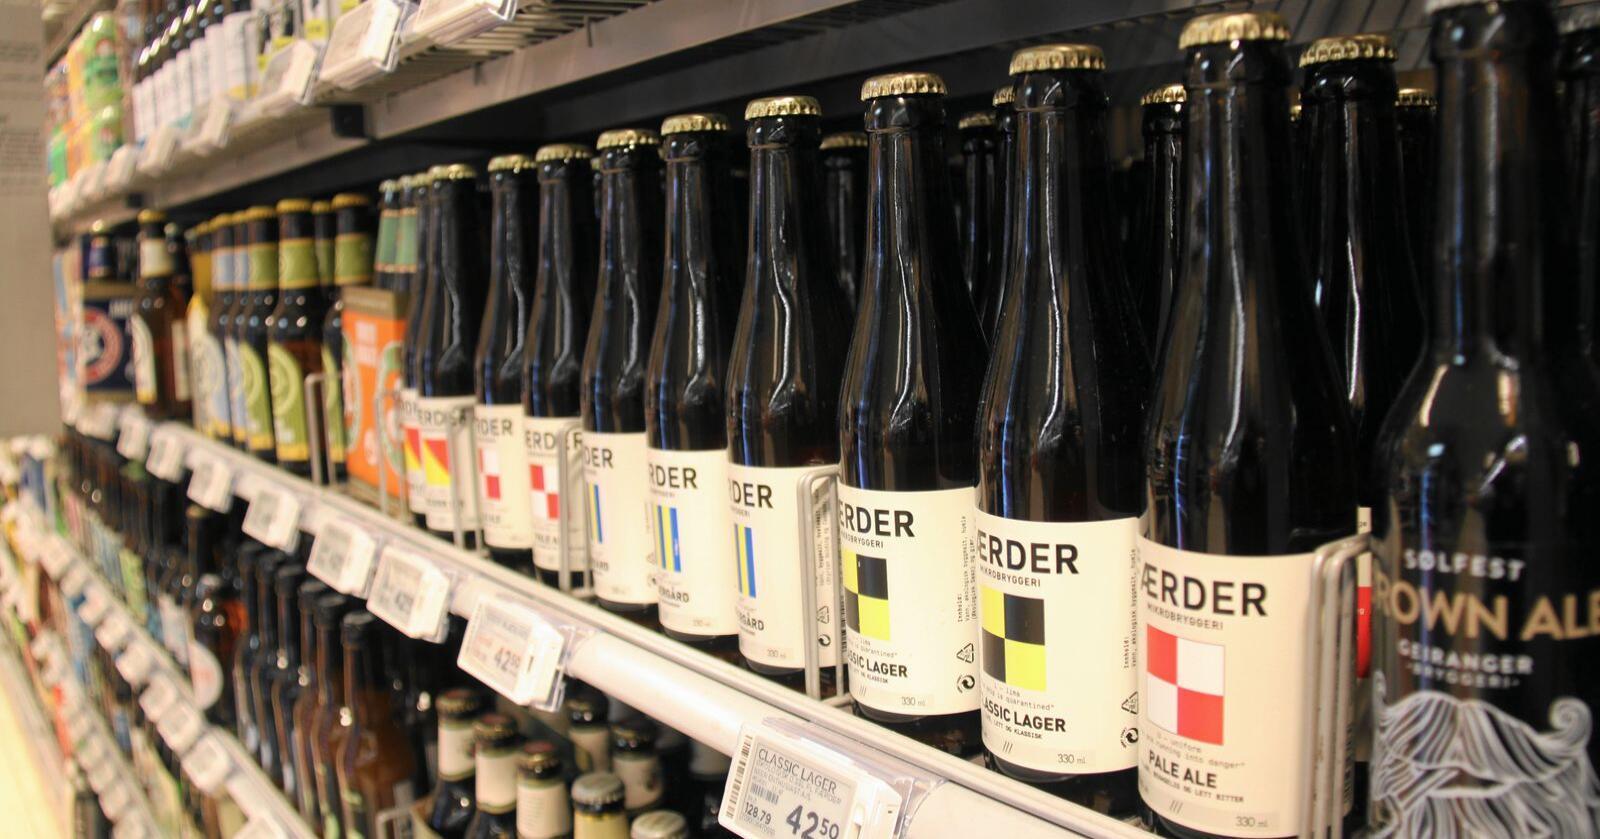 Salget av norsk øl, brus og vann har økt kraftig under koronautbruddet. Foto: Jon Haaland